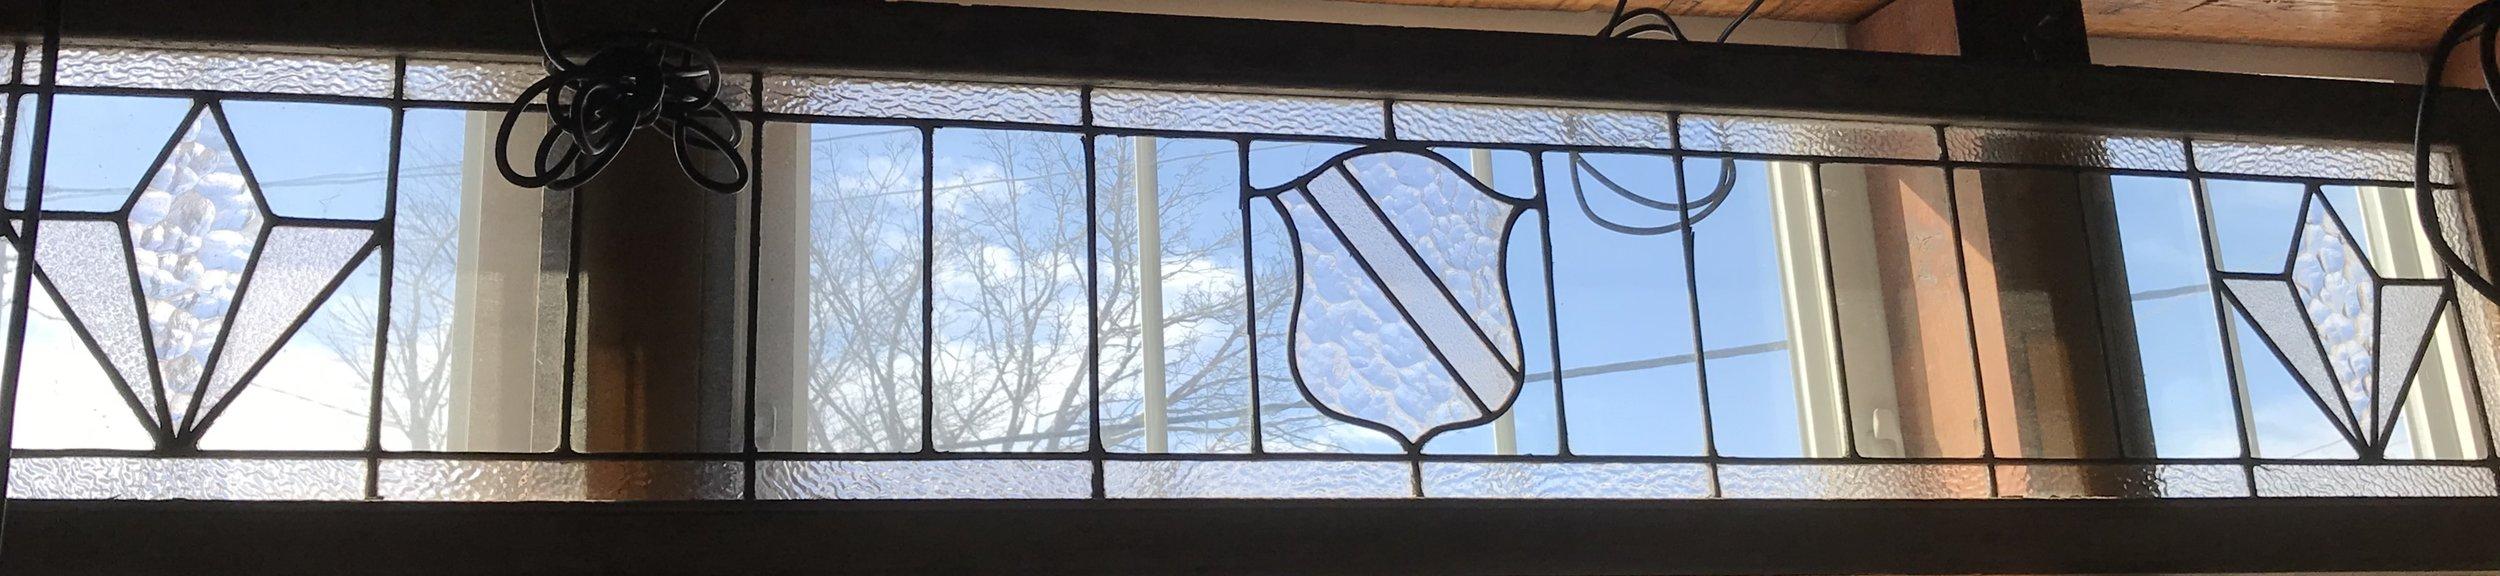 Long 1930's Leaded glass Transom